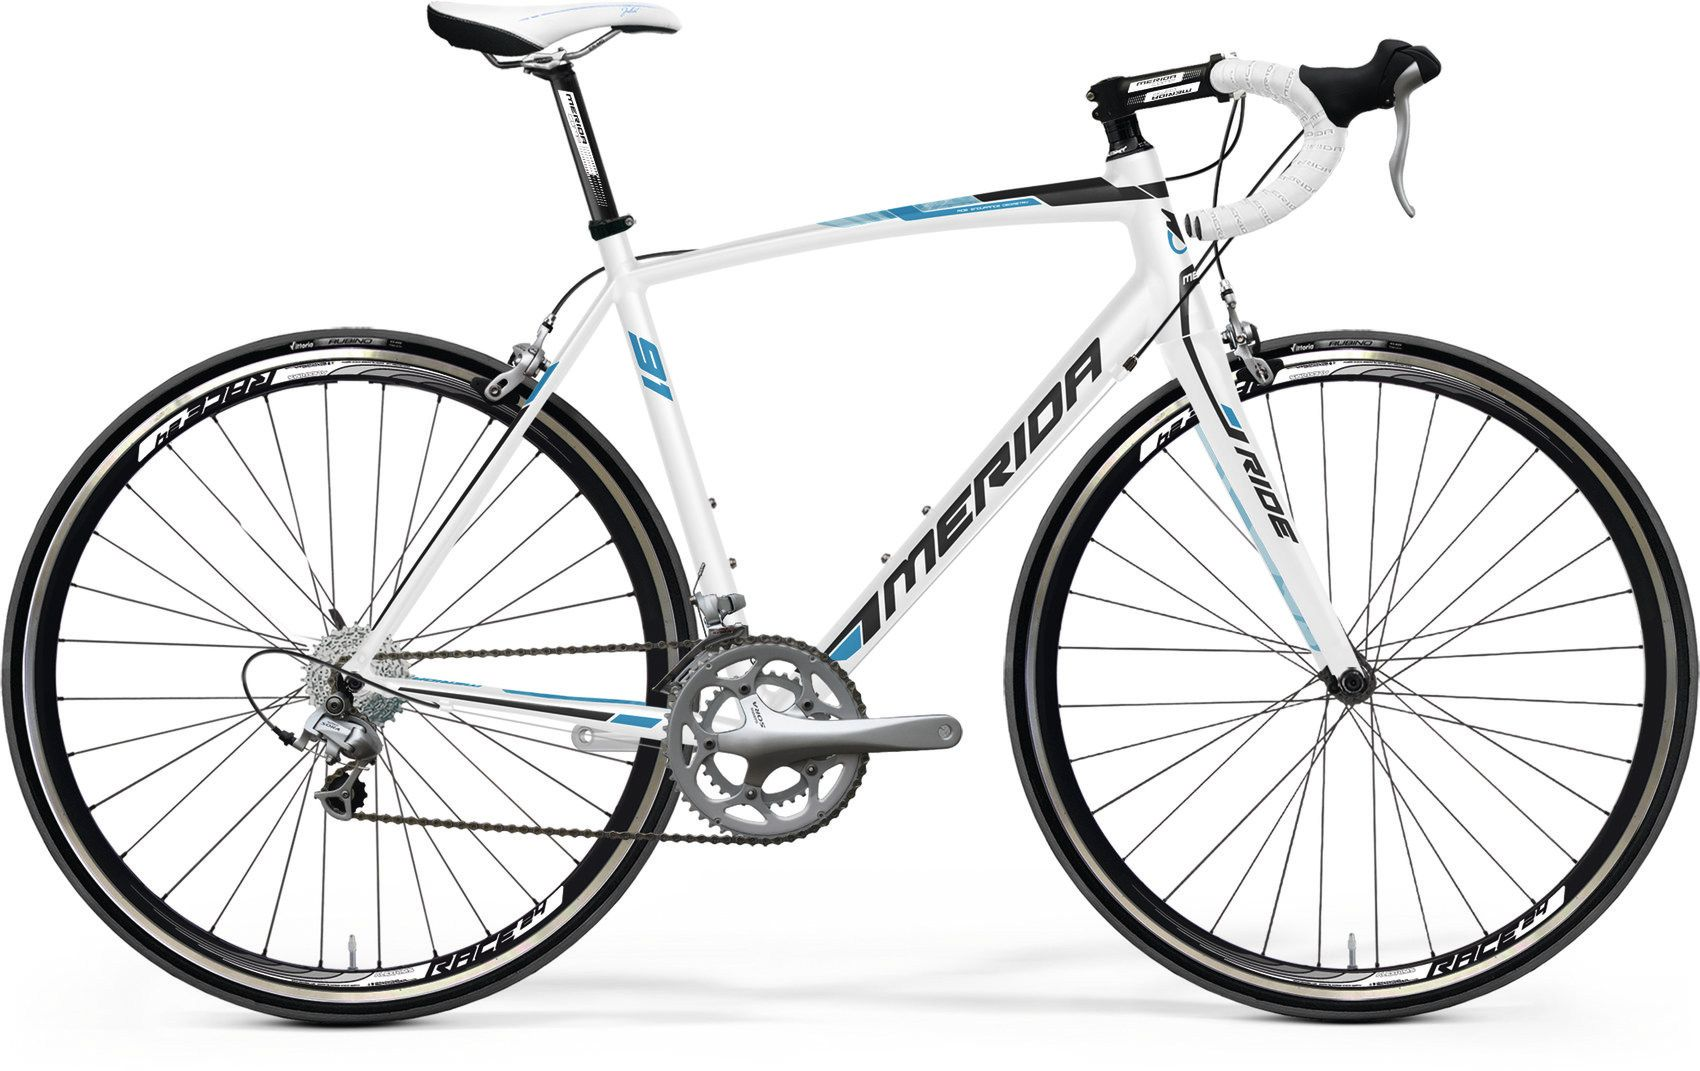 Ride Lite Juliet 91 - Merida Bikes | bike | Merida bikes